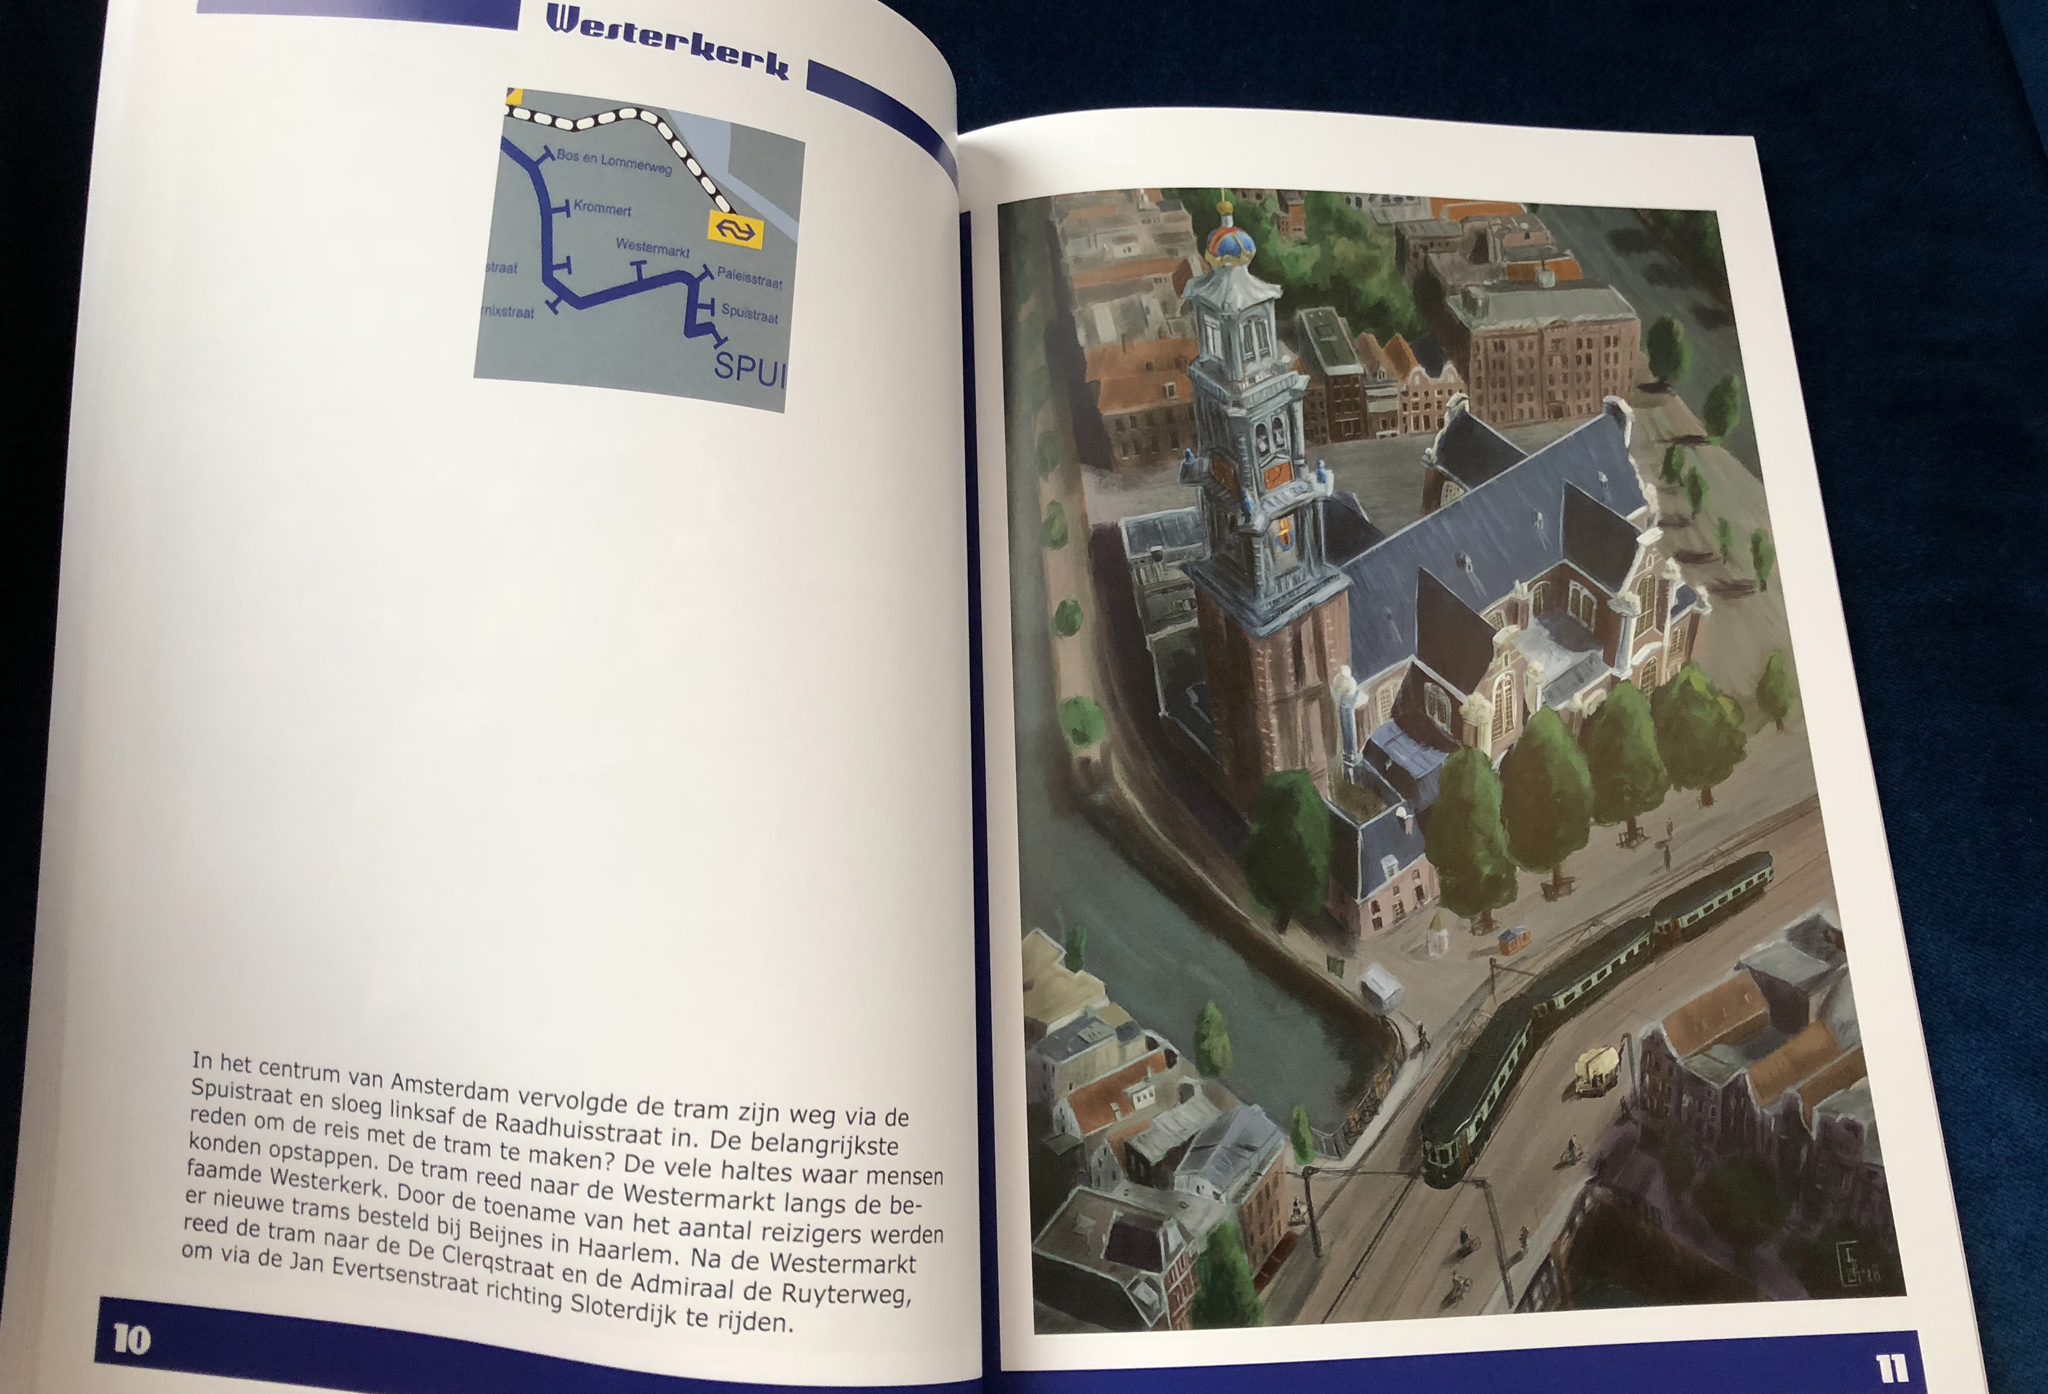 We gaan naar Zandvoort! Westerkerk blauwe tram